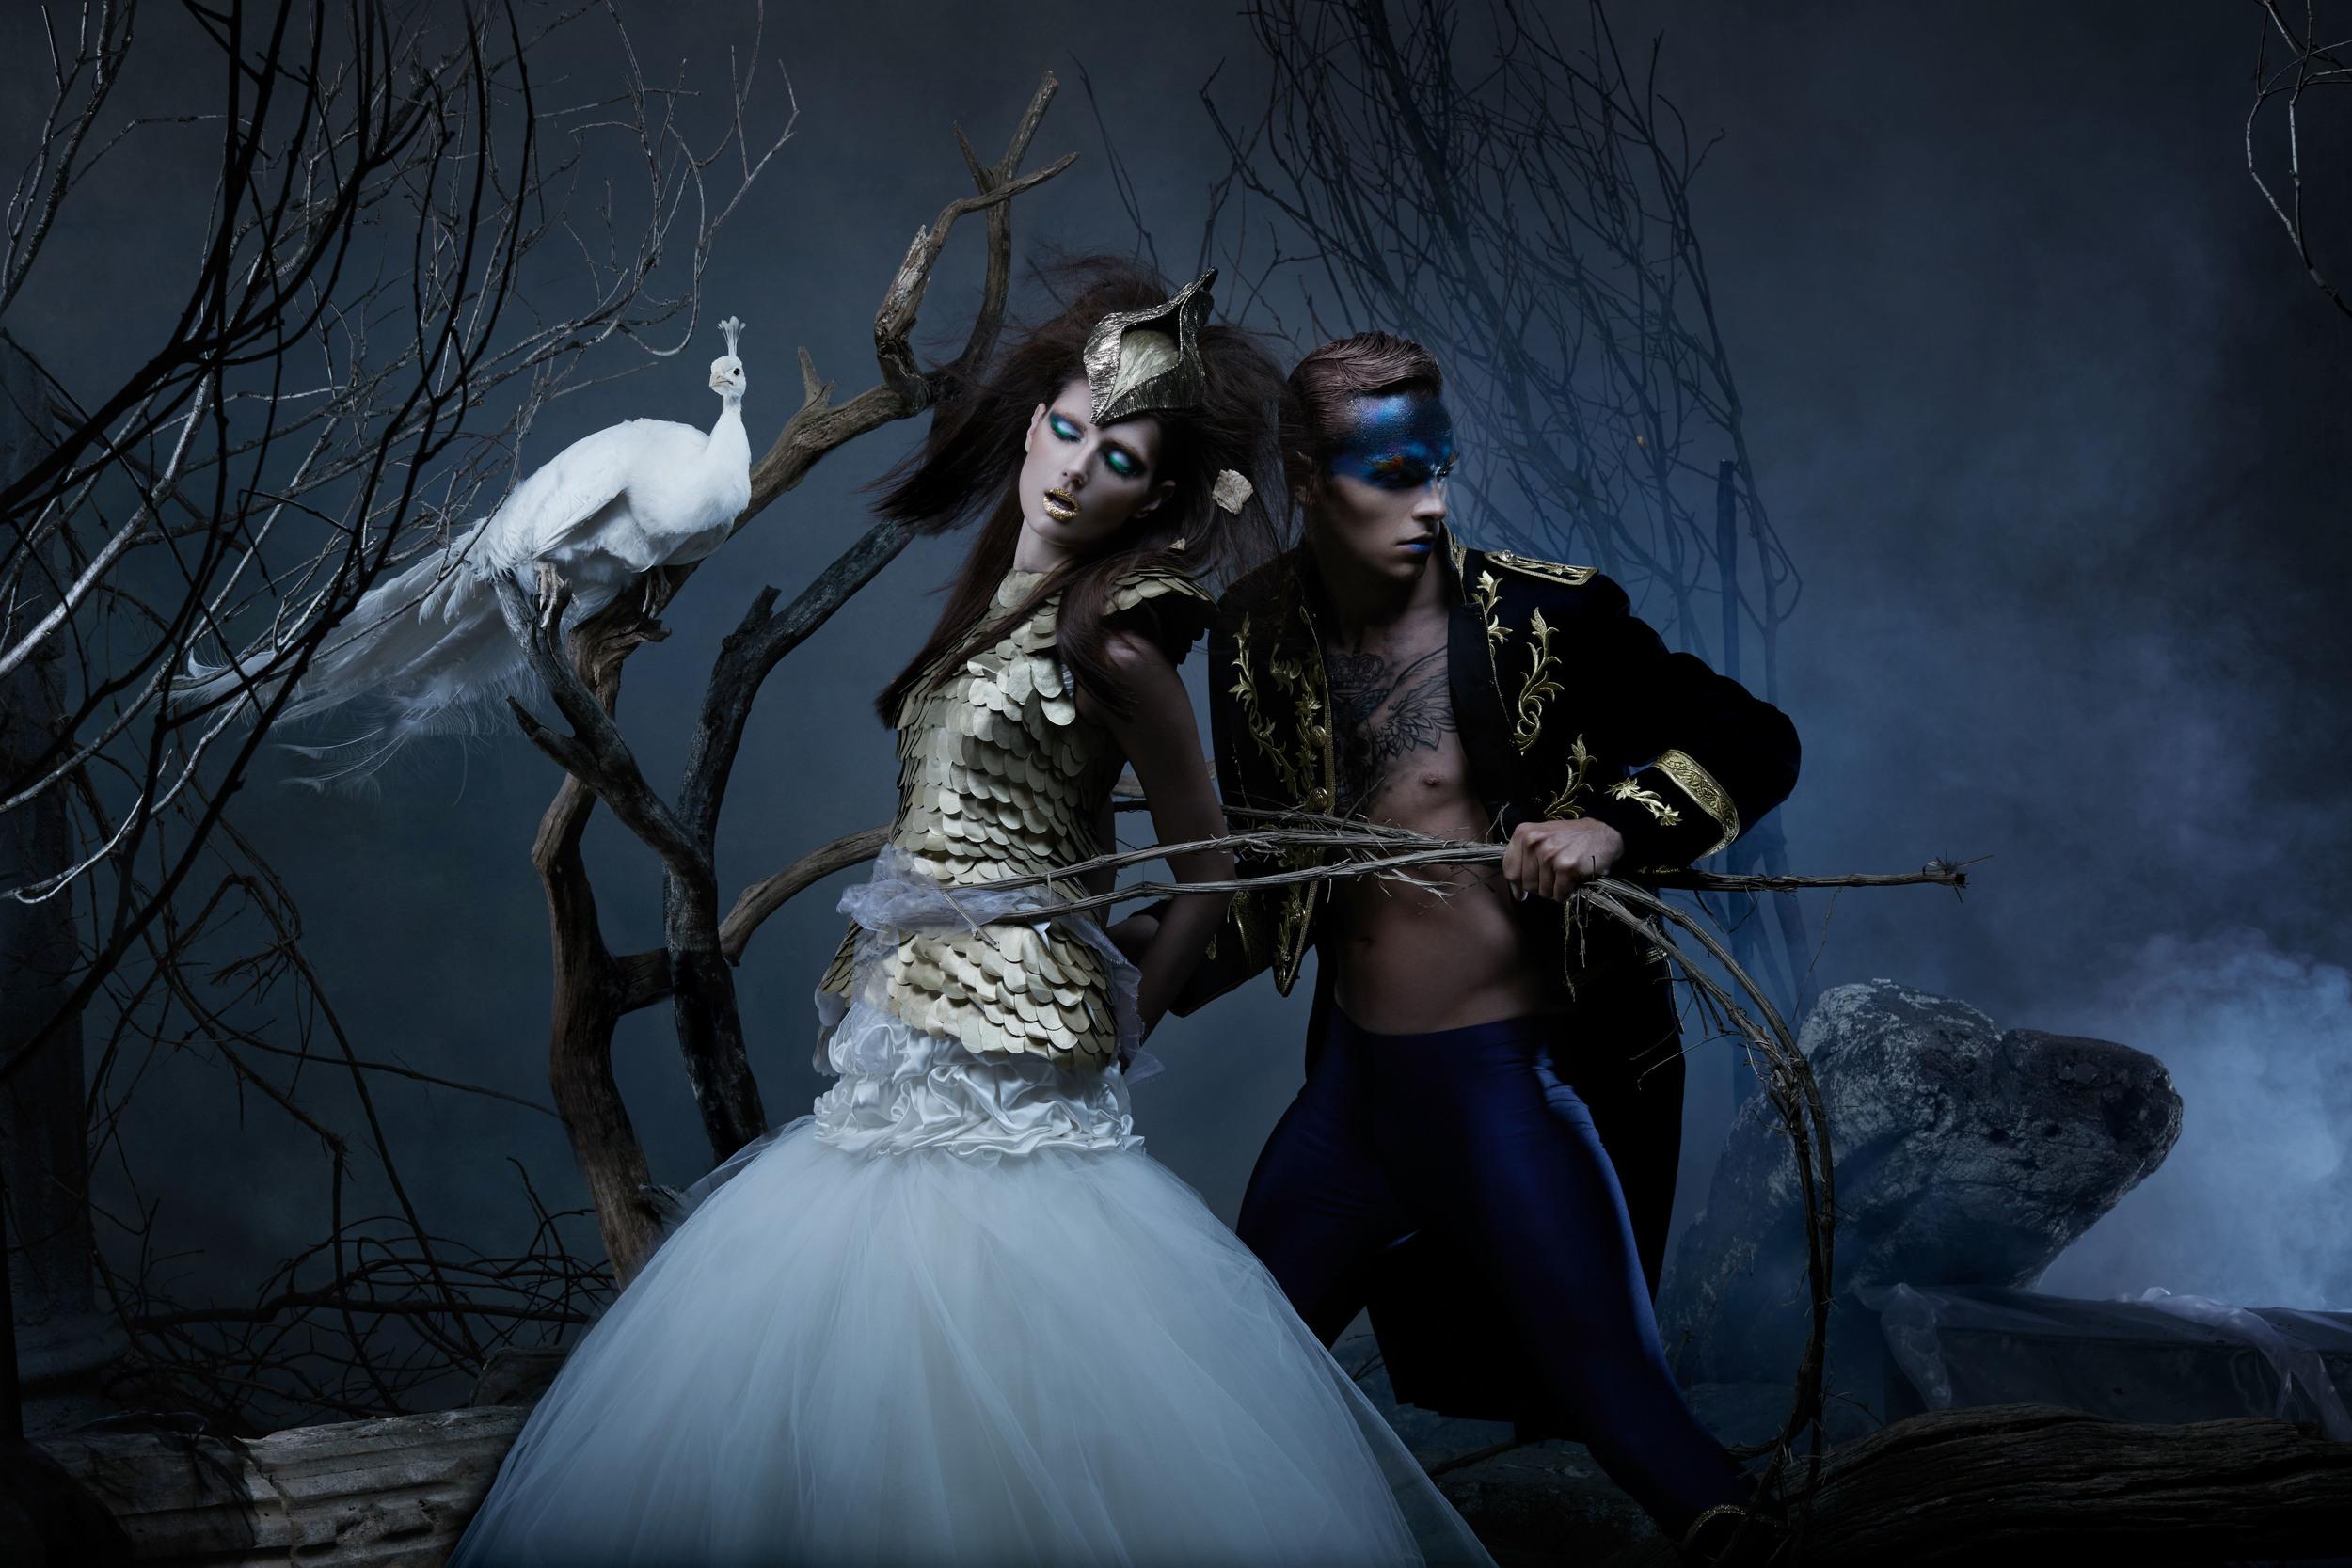 Kryolan Campaign Photographer: Camille Sanson